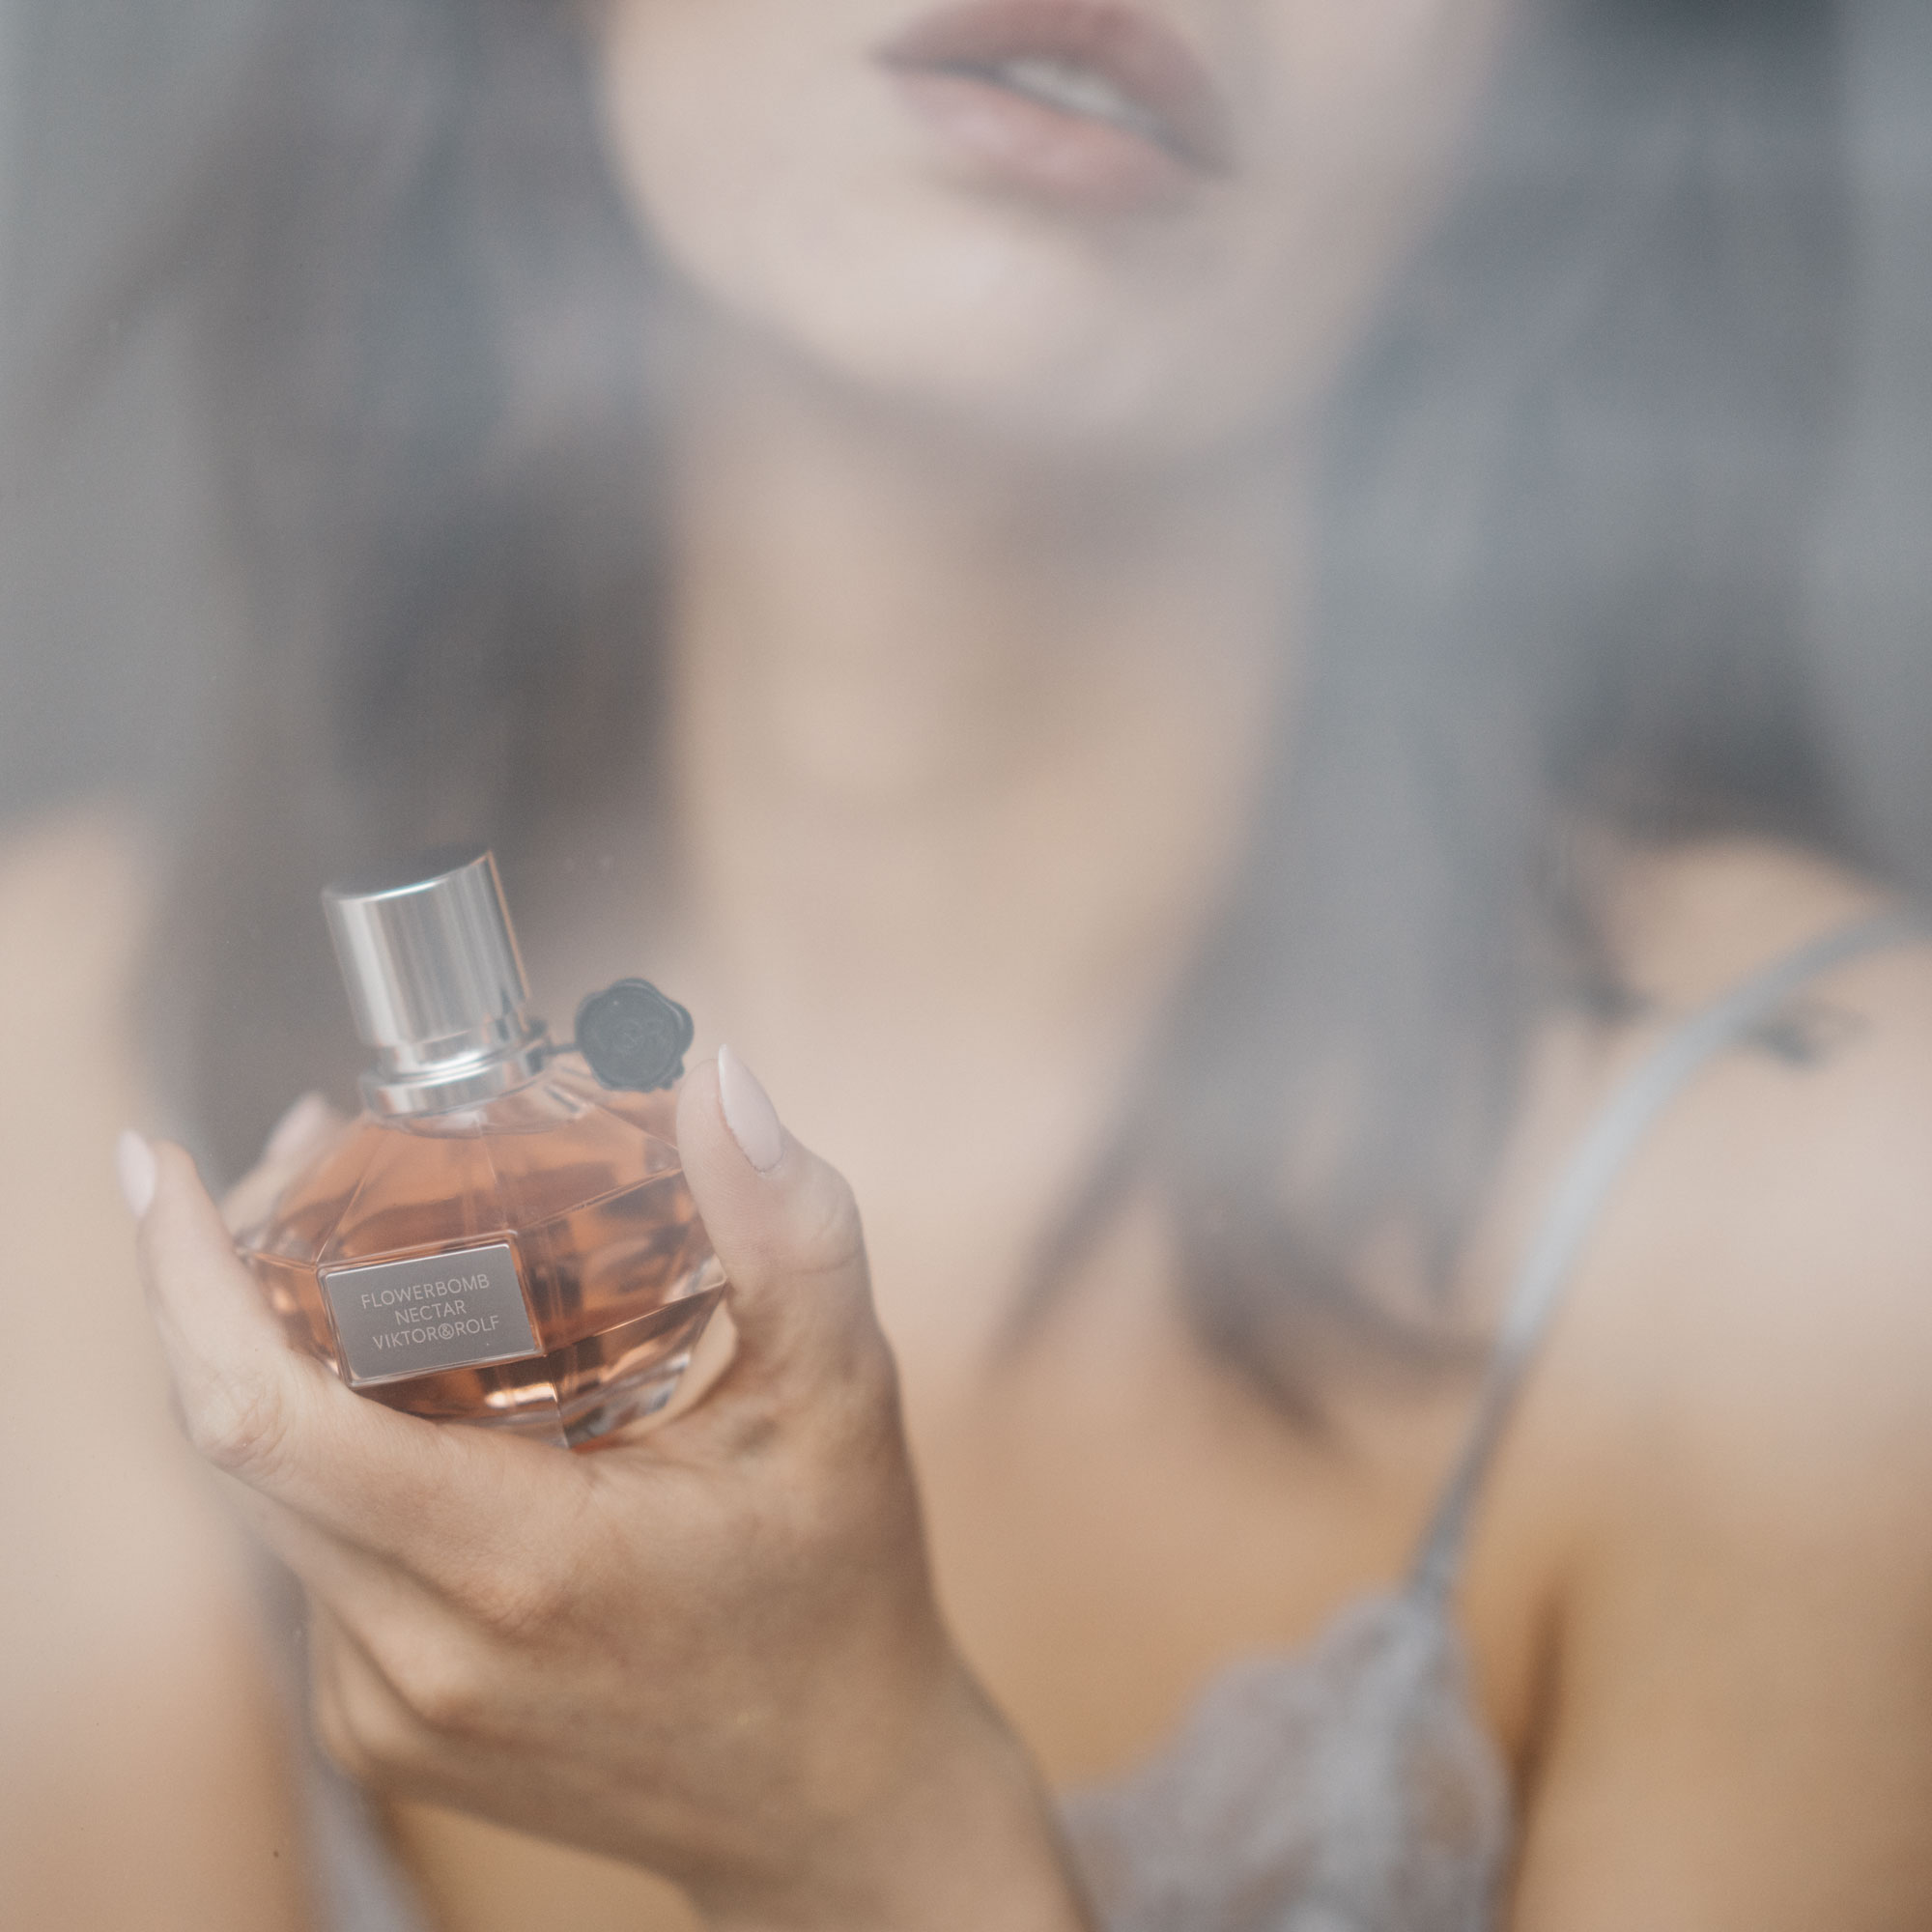 Viktor & Rolf Parfum | Flowerbomb Nectar | Masha Sedgwick | Blogger / Influencer Campaign